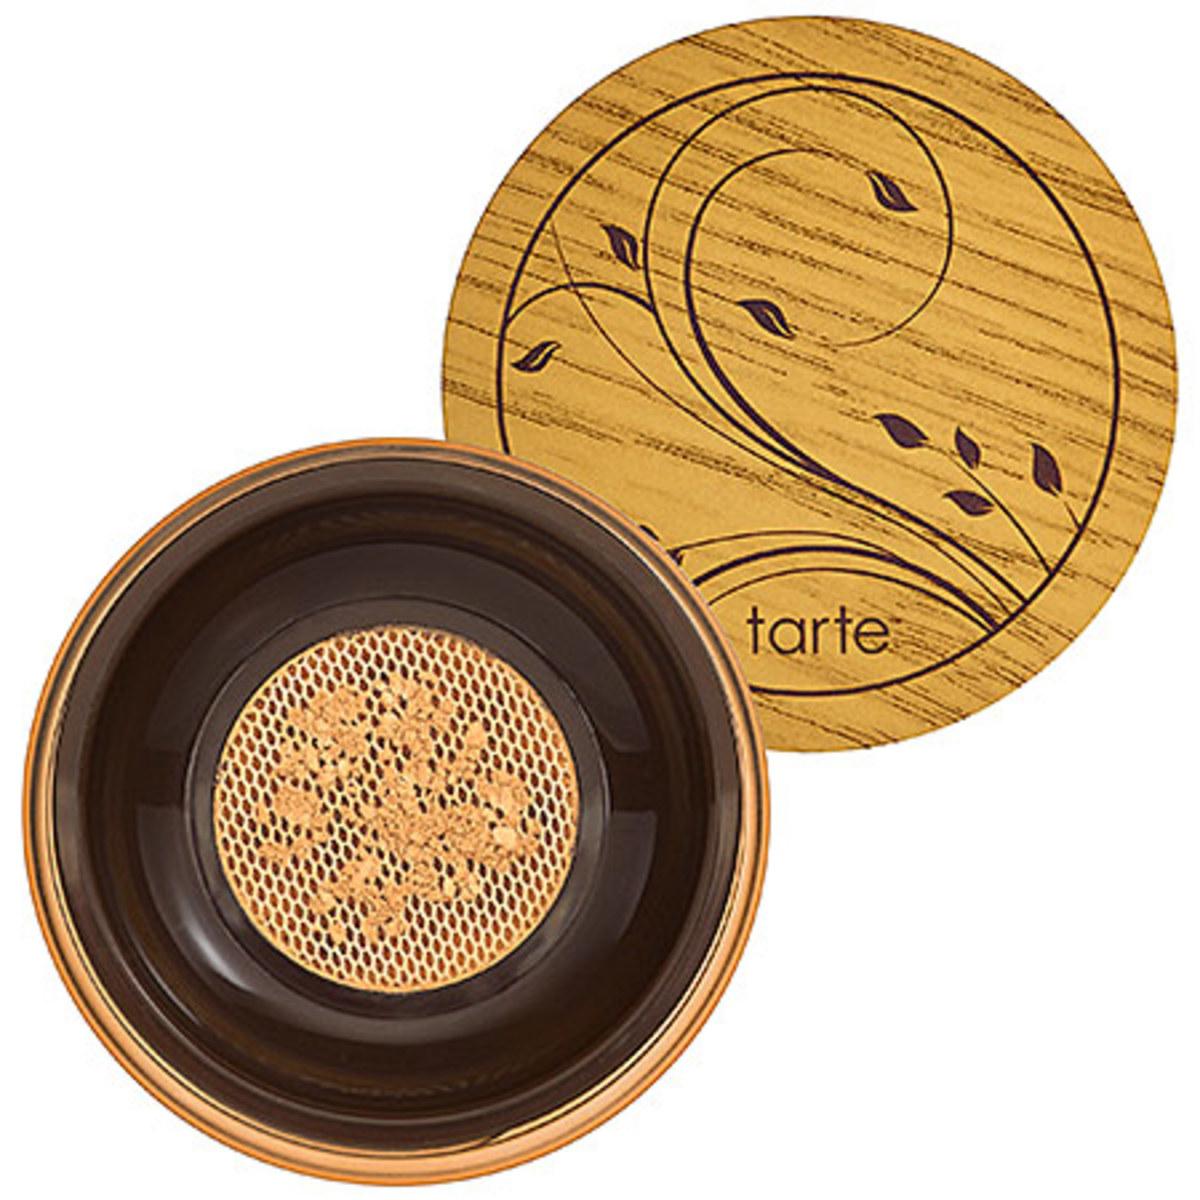 Tarte Amazonian Clay Airbrush Foundation in Fair-Light Honey